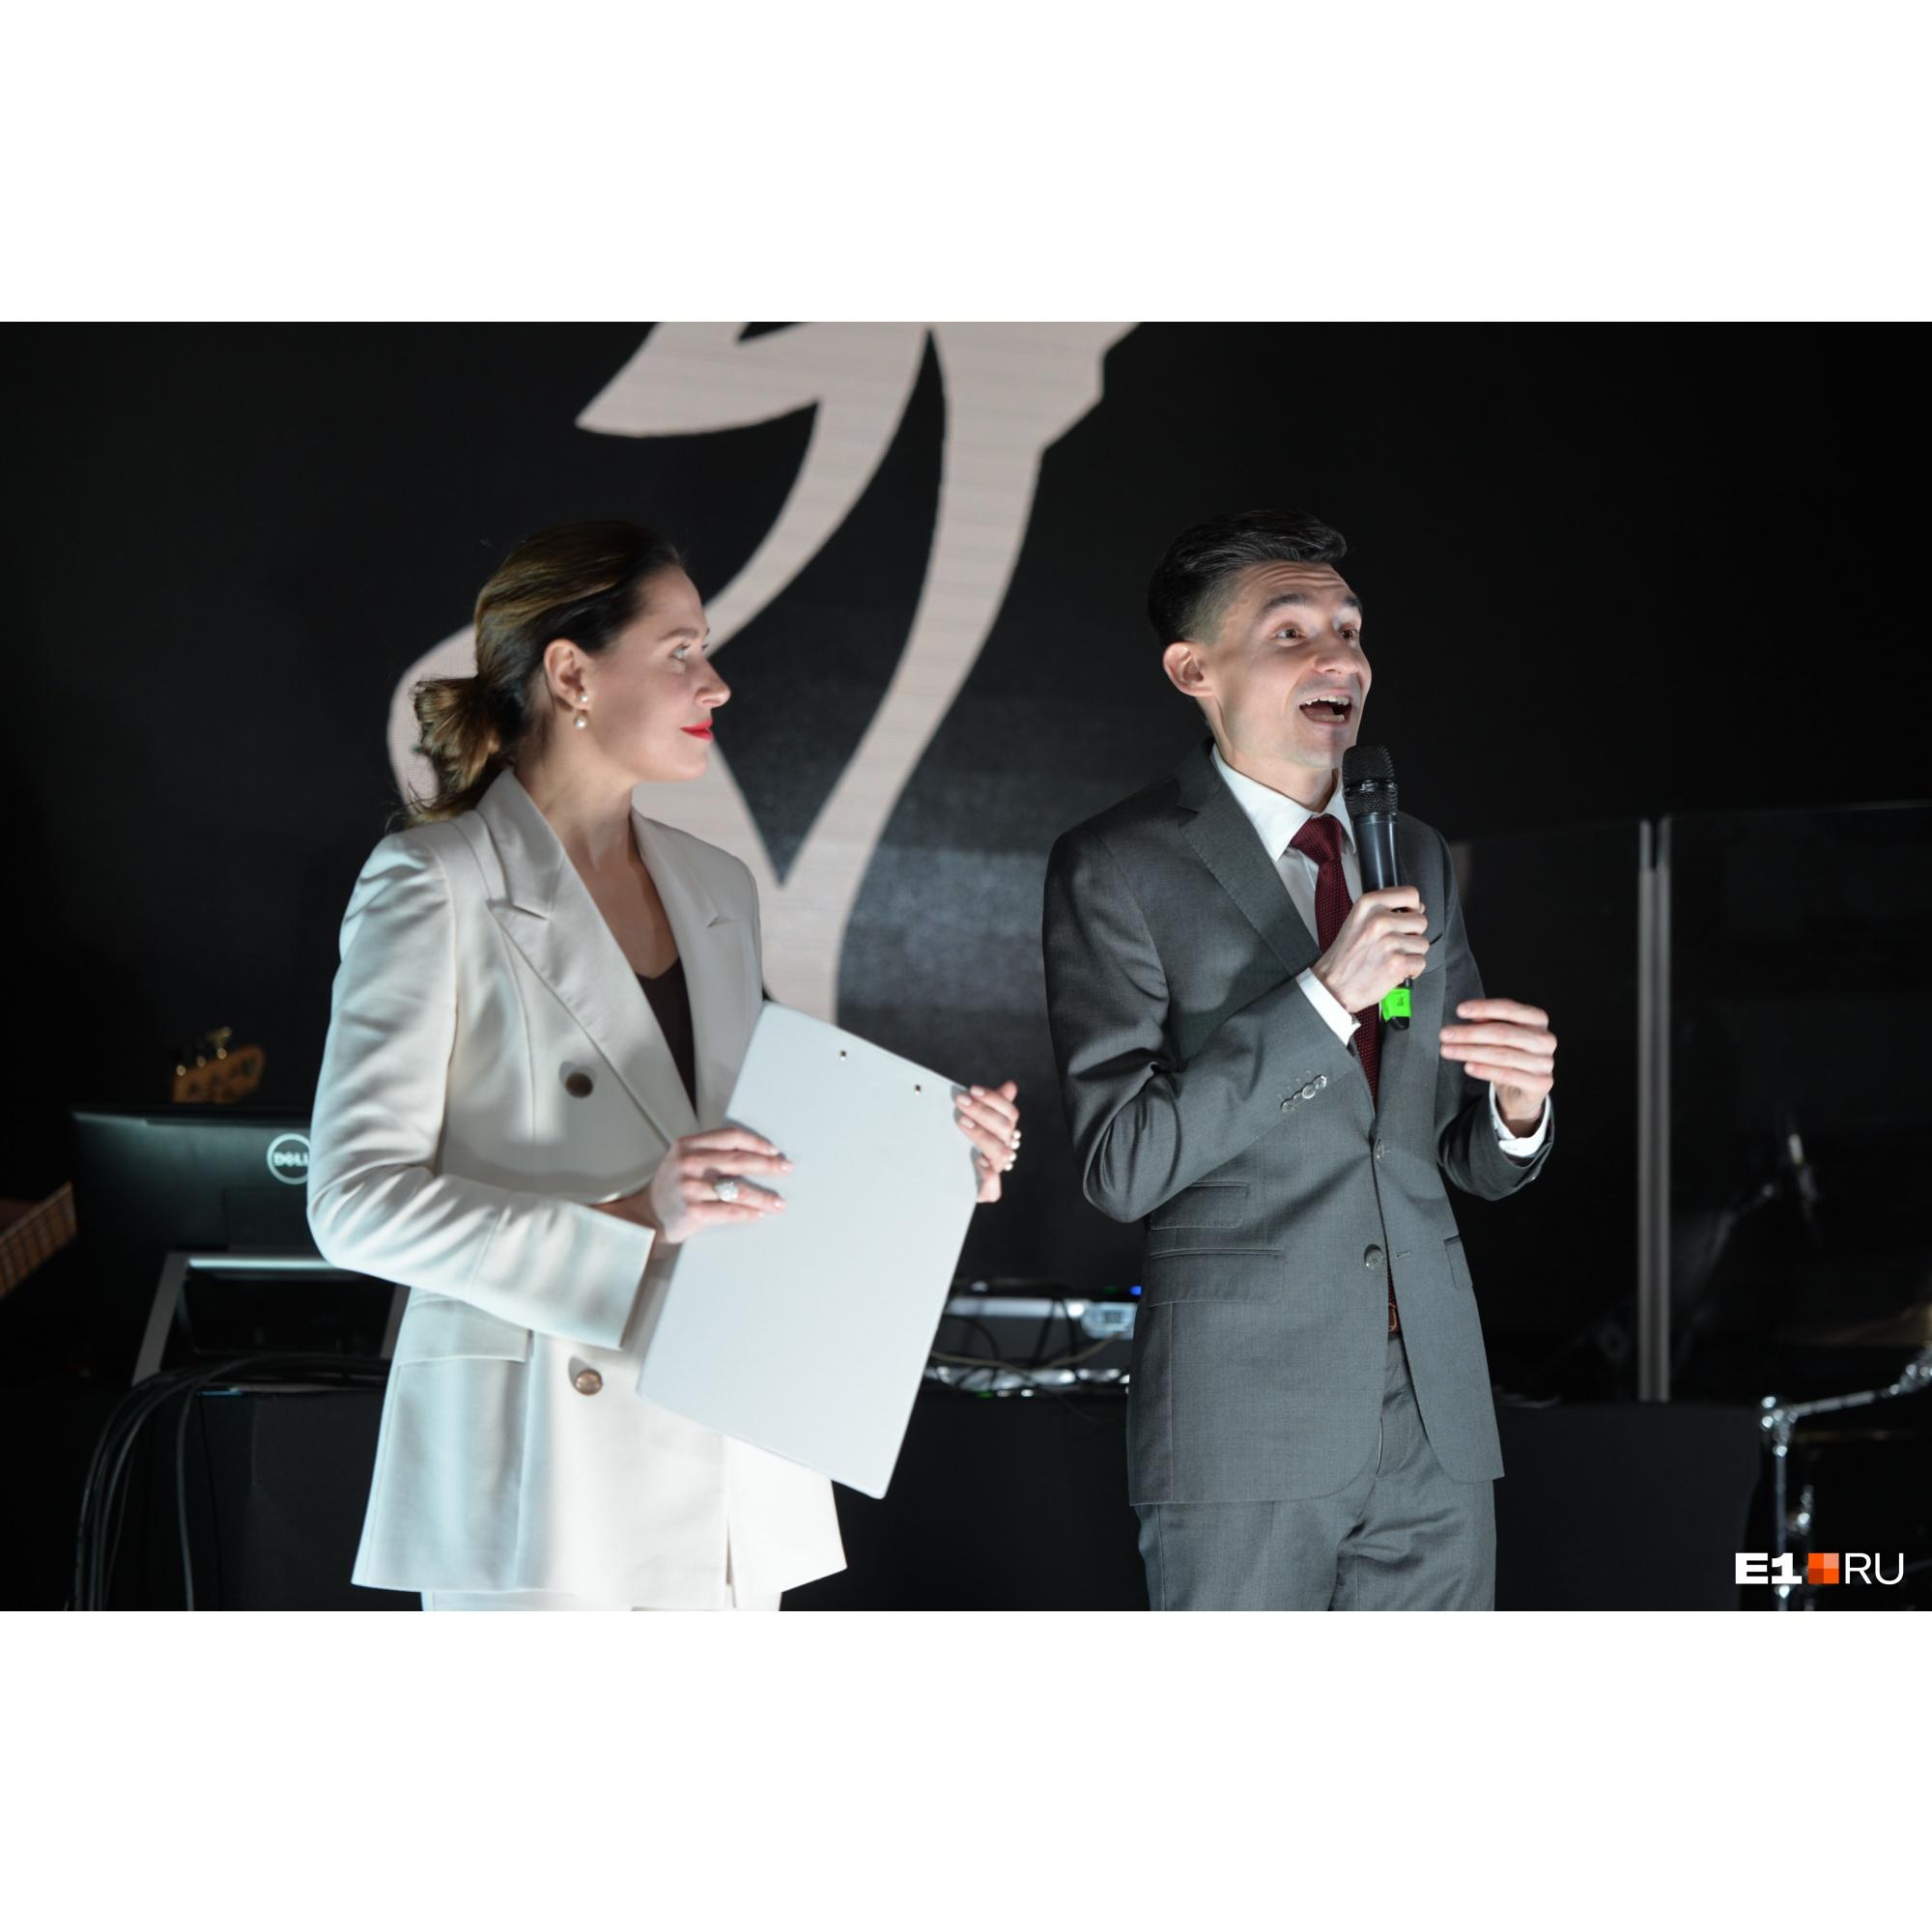 "А ведущей была Джулия Игнатова, которую вы наверняка помните <a href=""https://www.e1.ru/news/spool/news_id-65524571.html"" target=""_blank"" class=""_"">по Народной премии E1.RU</a>"